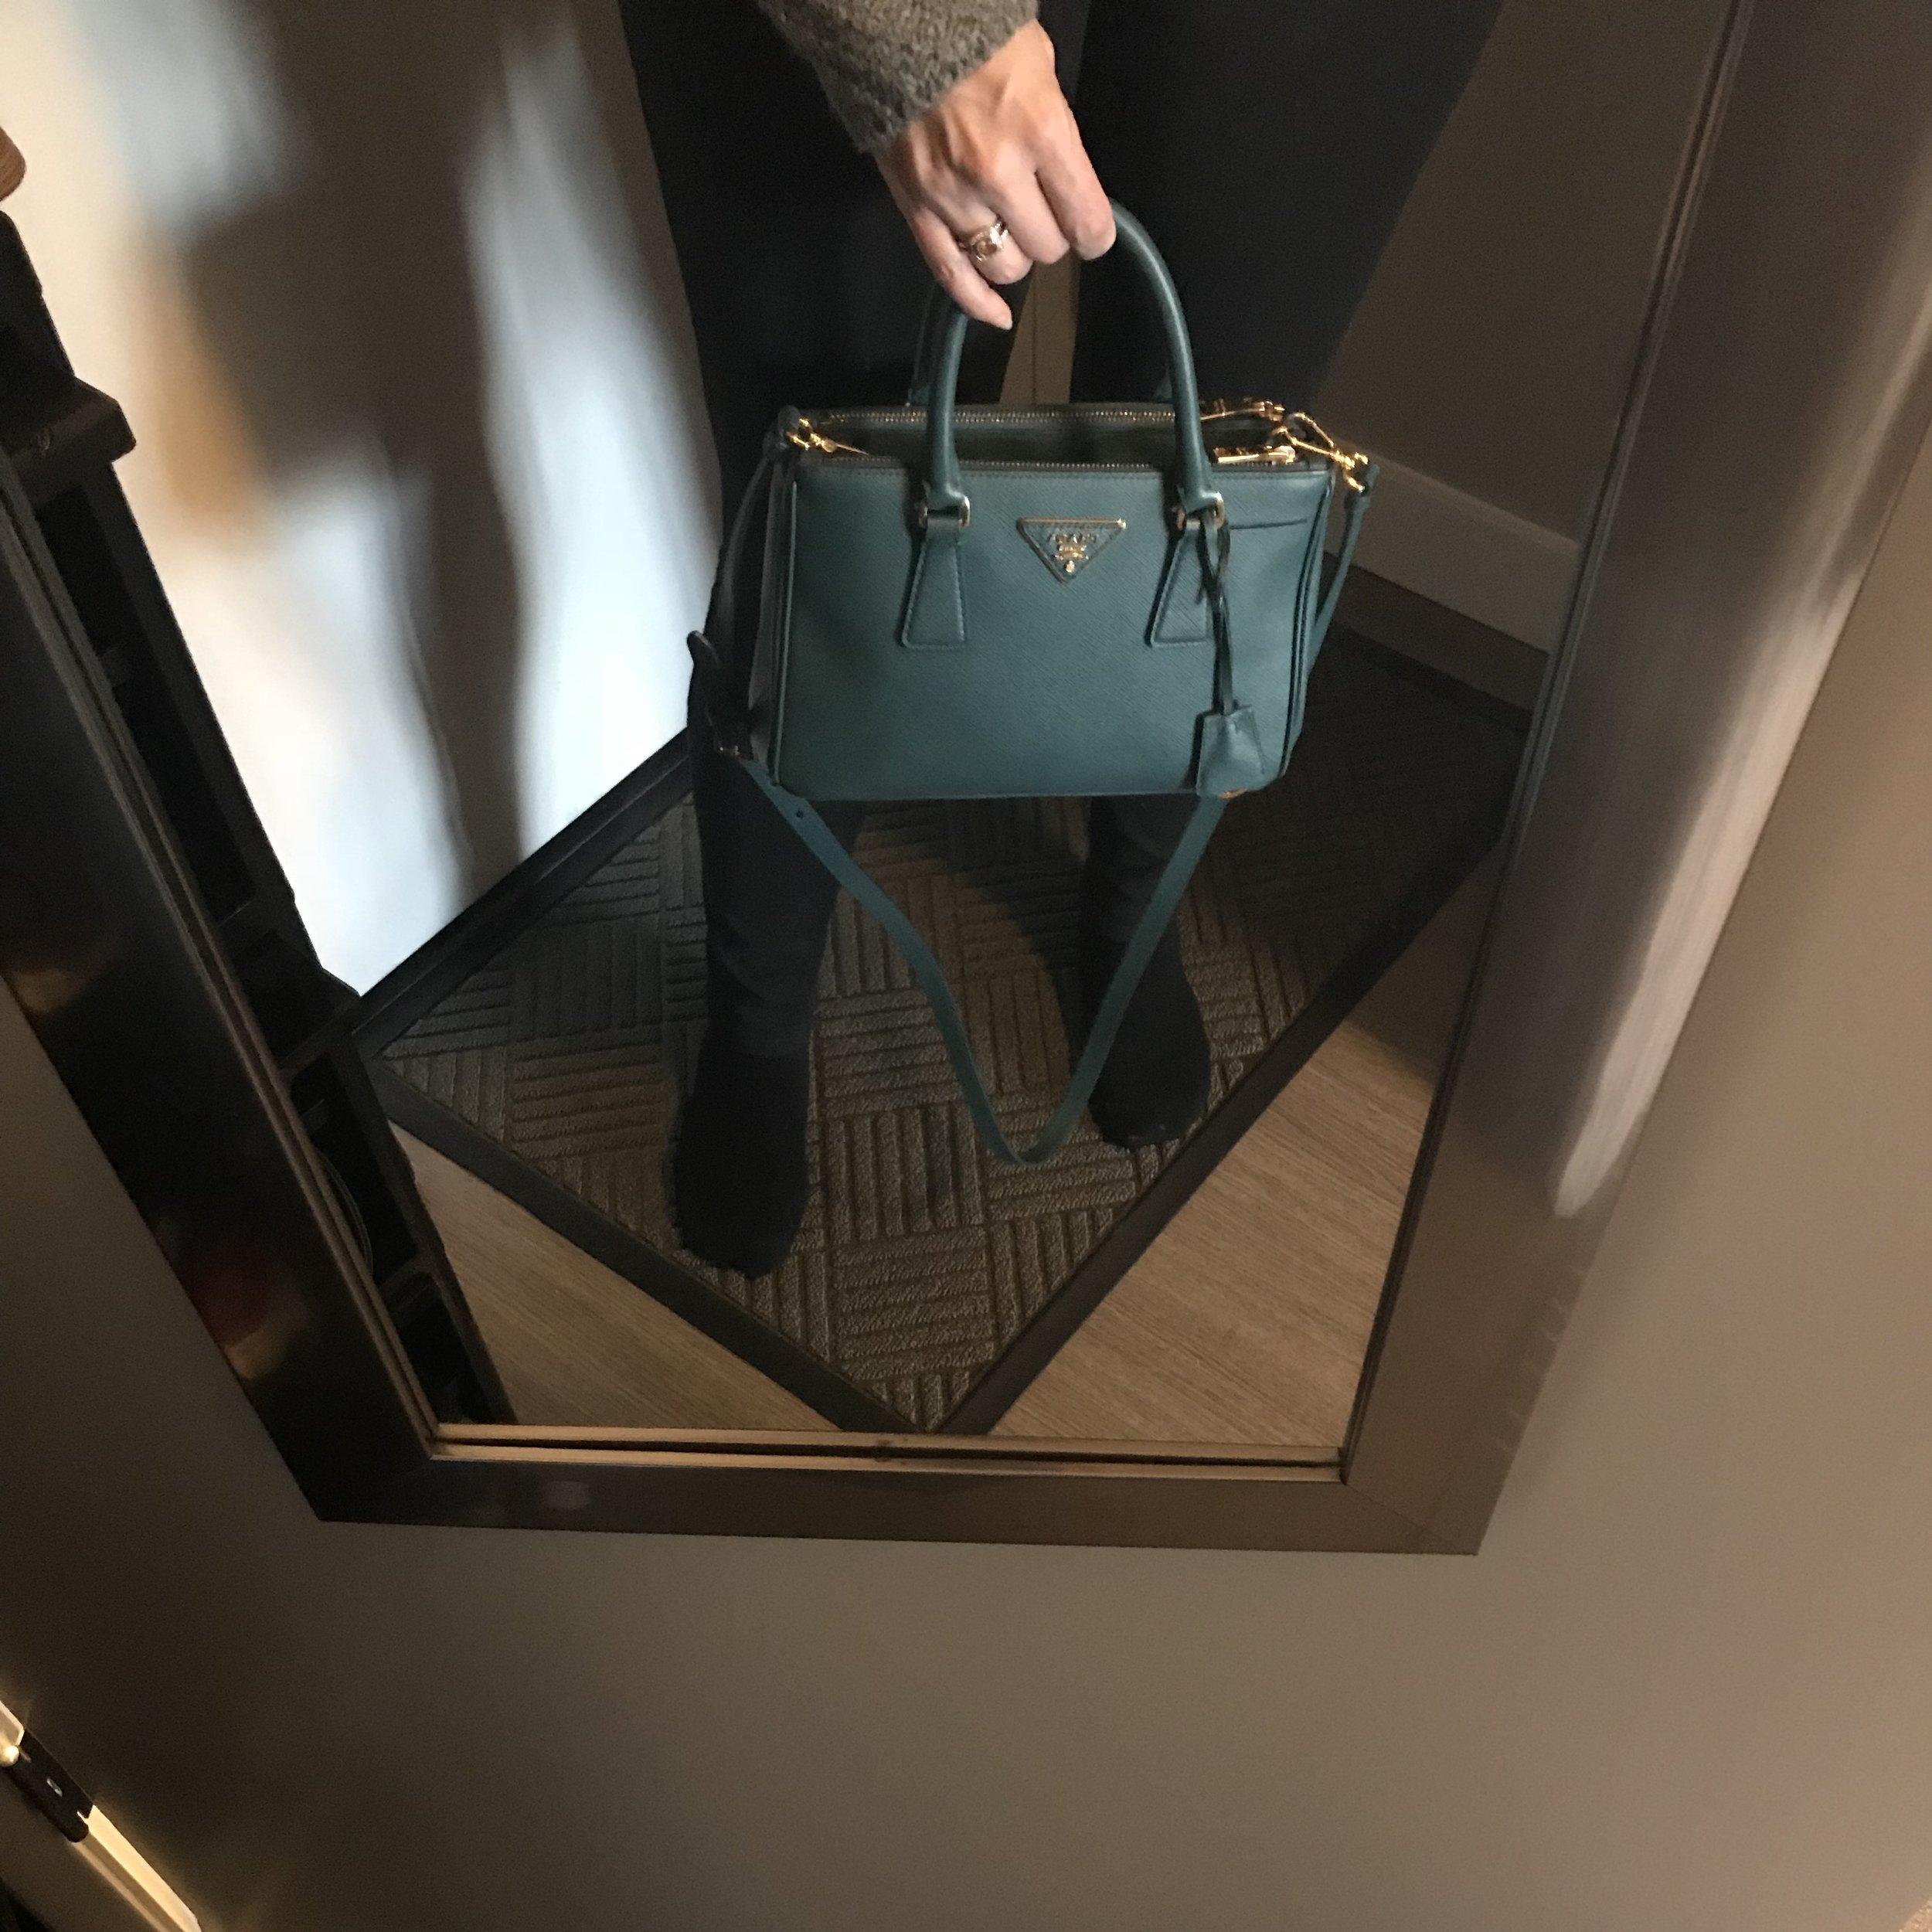 Prada Galleria Double Zip Tote size Mini in action